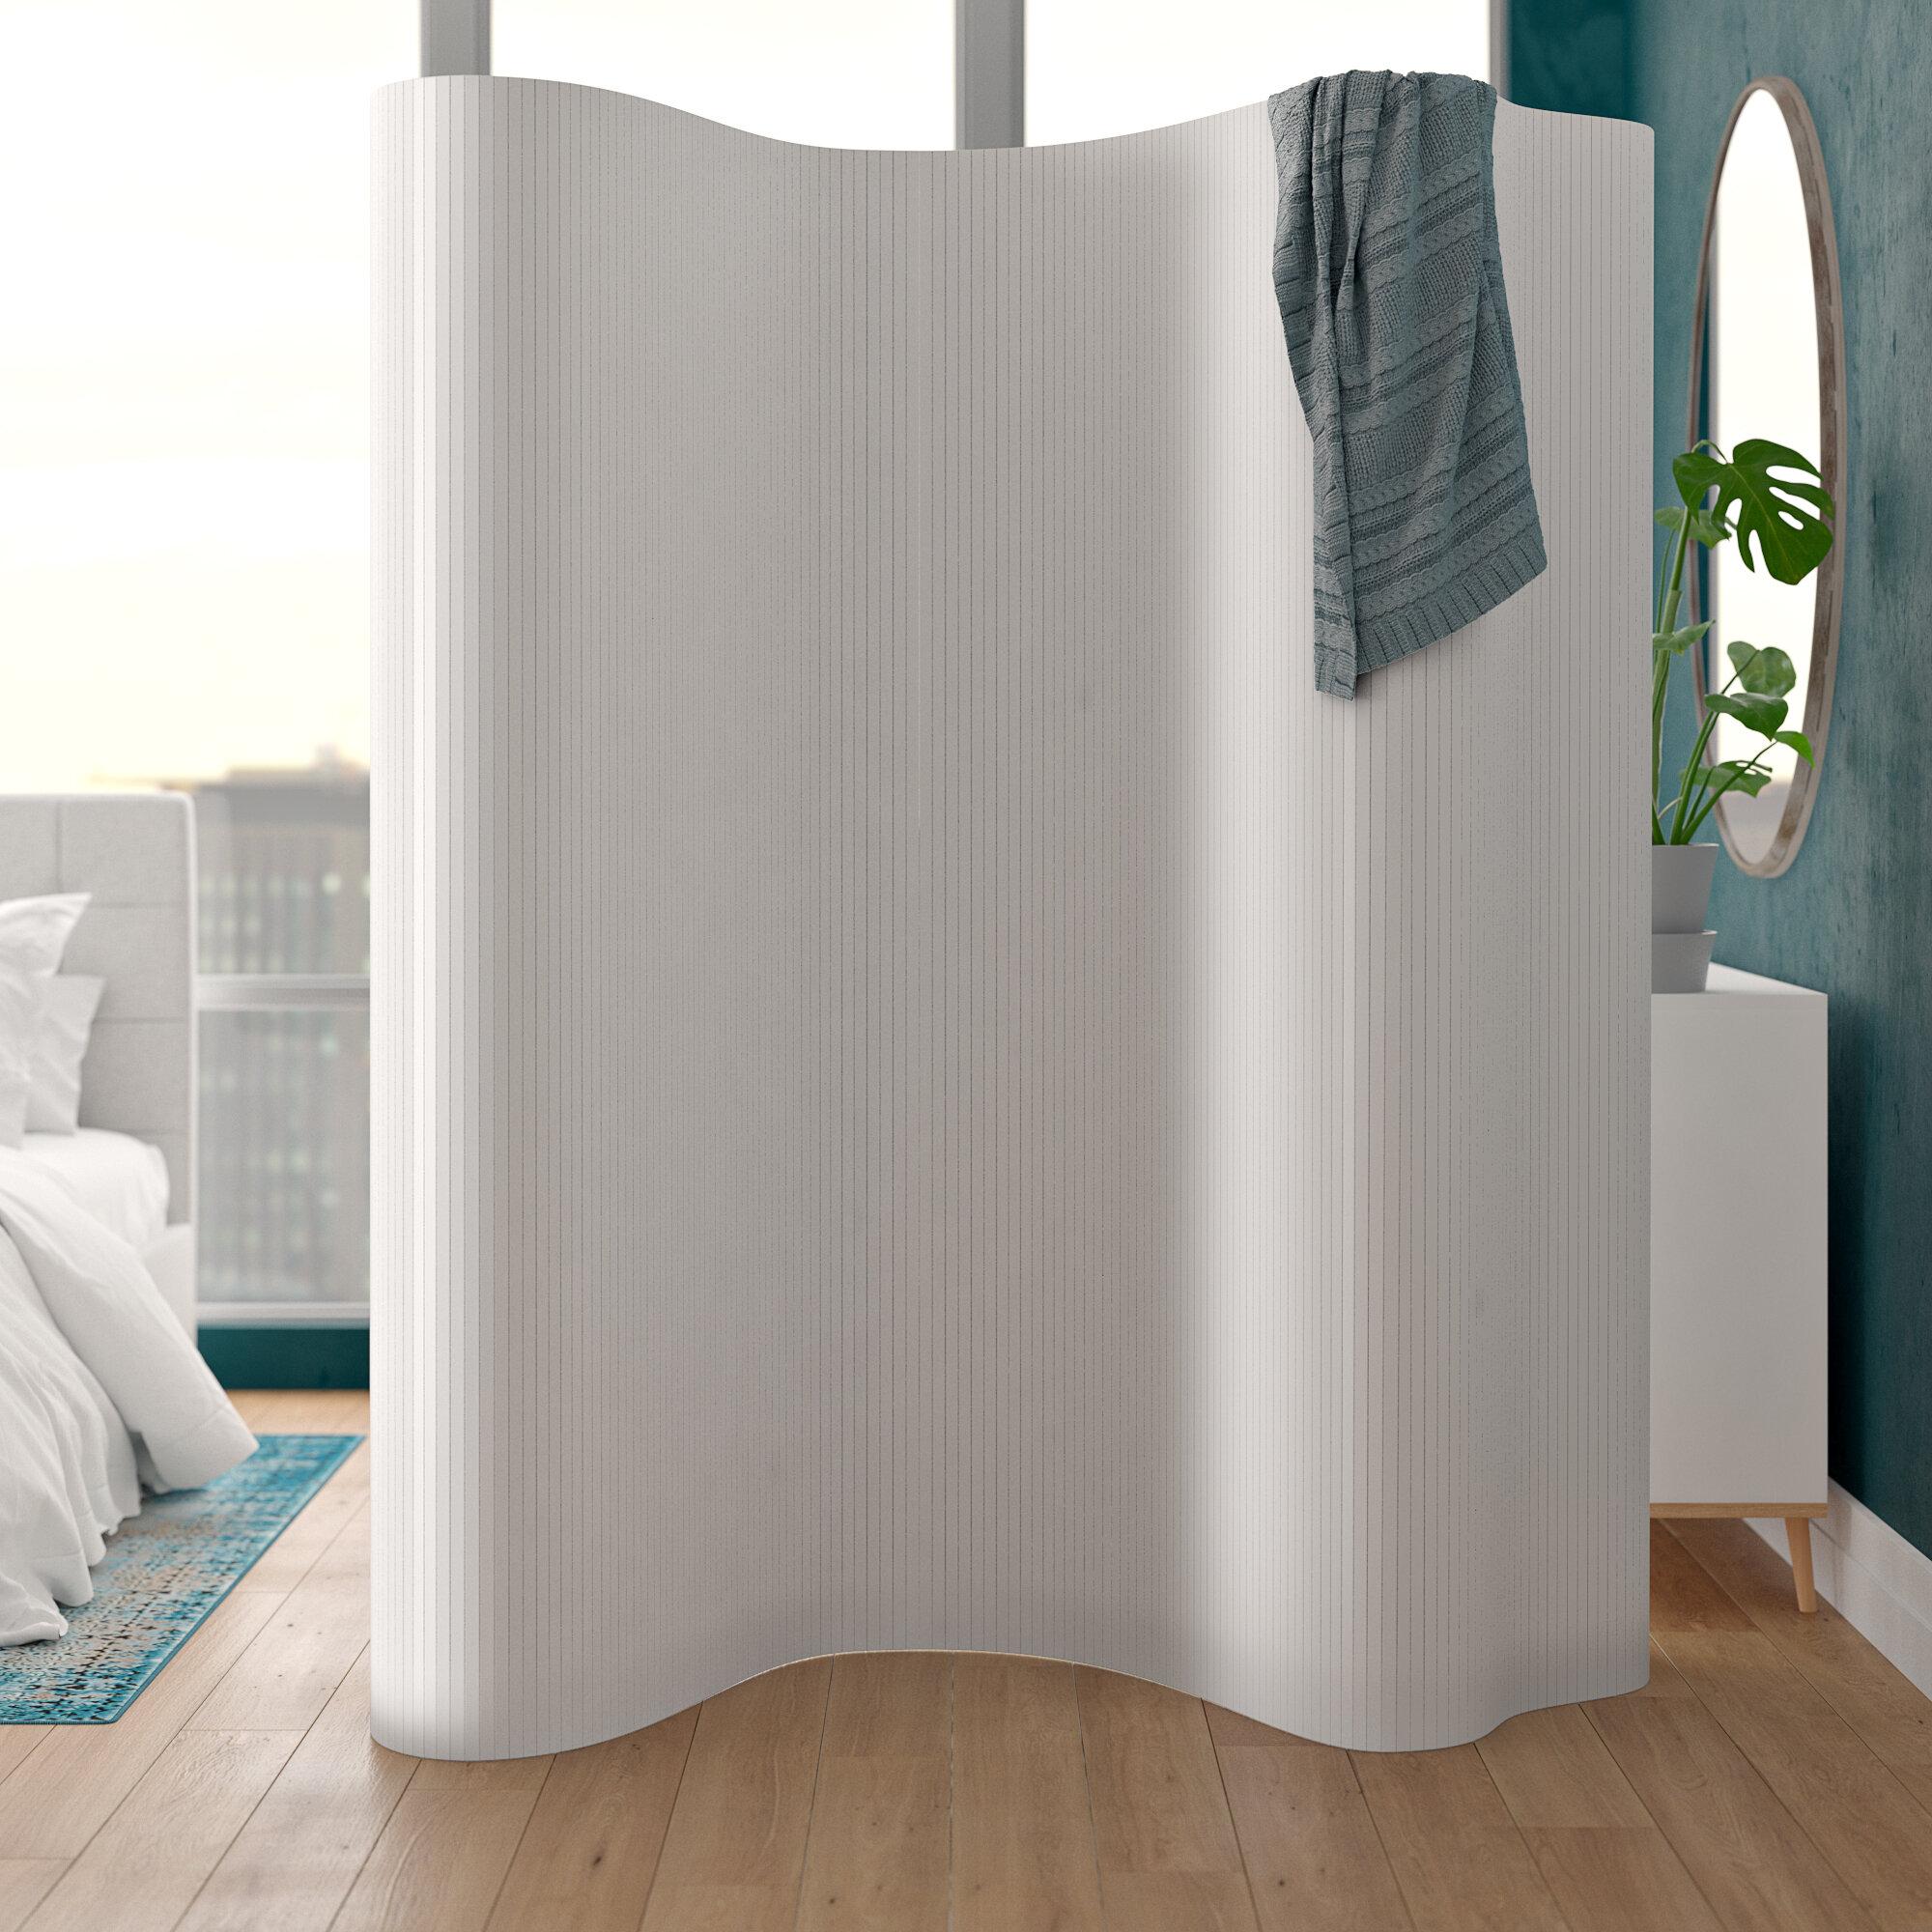 Schlafzimmer Paravent Als Raumteiler – Caseconrad.com